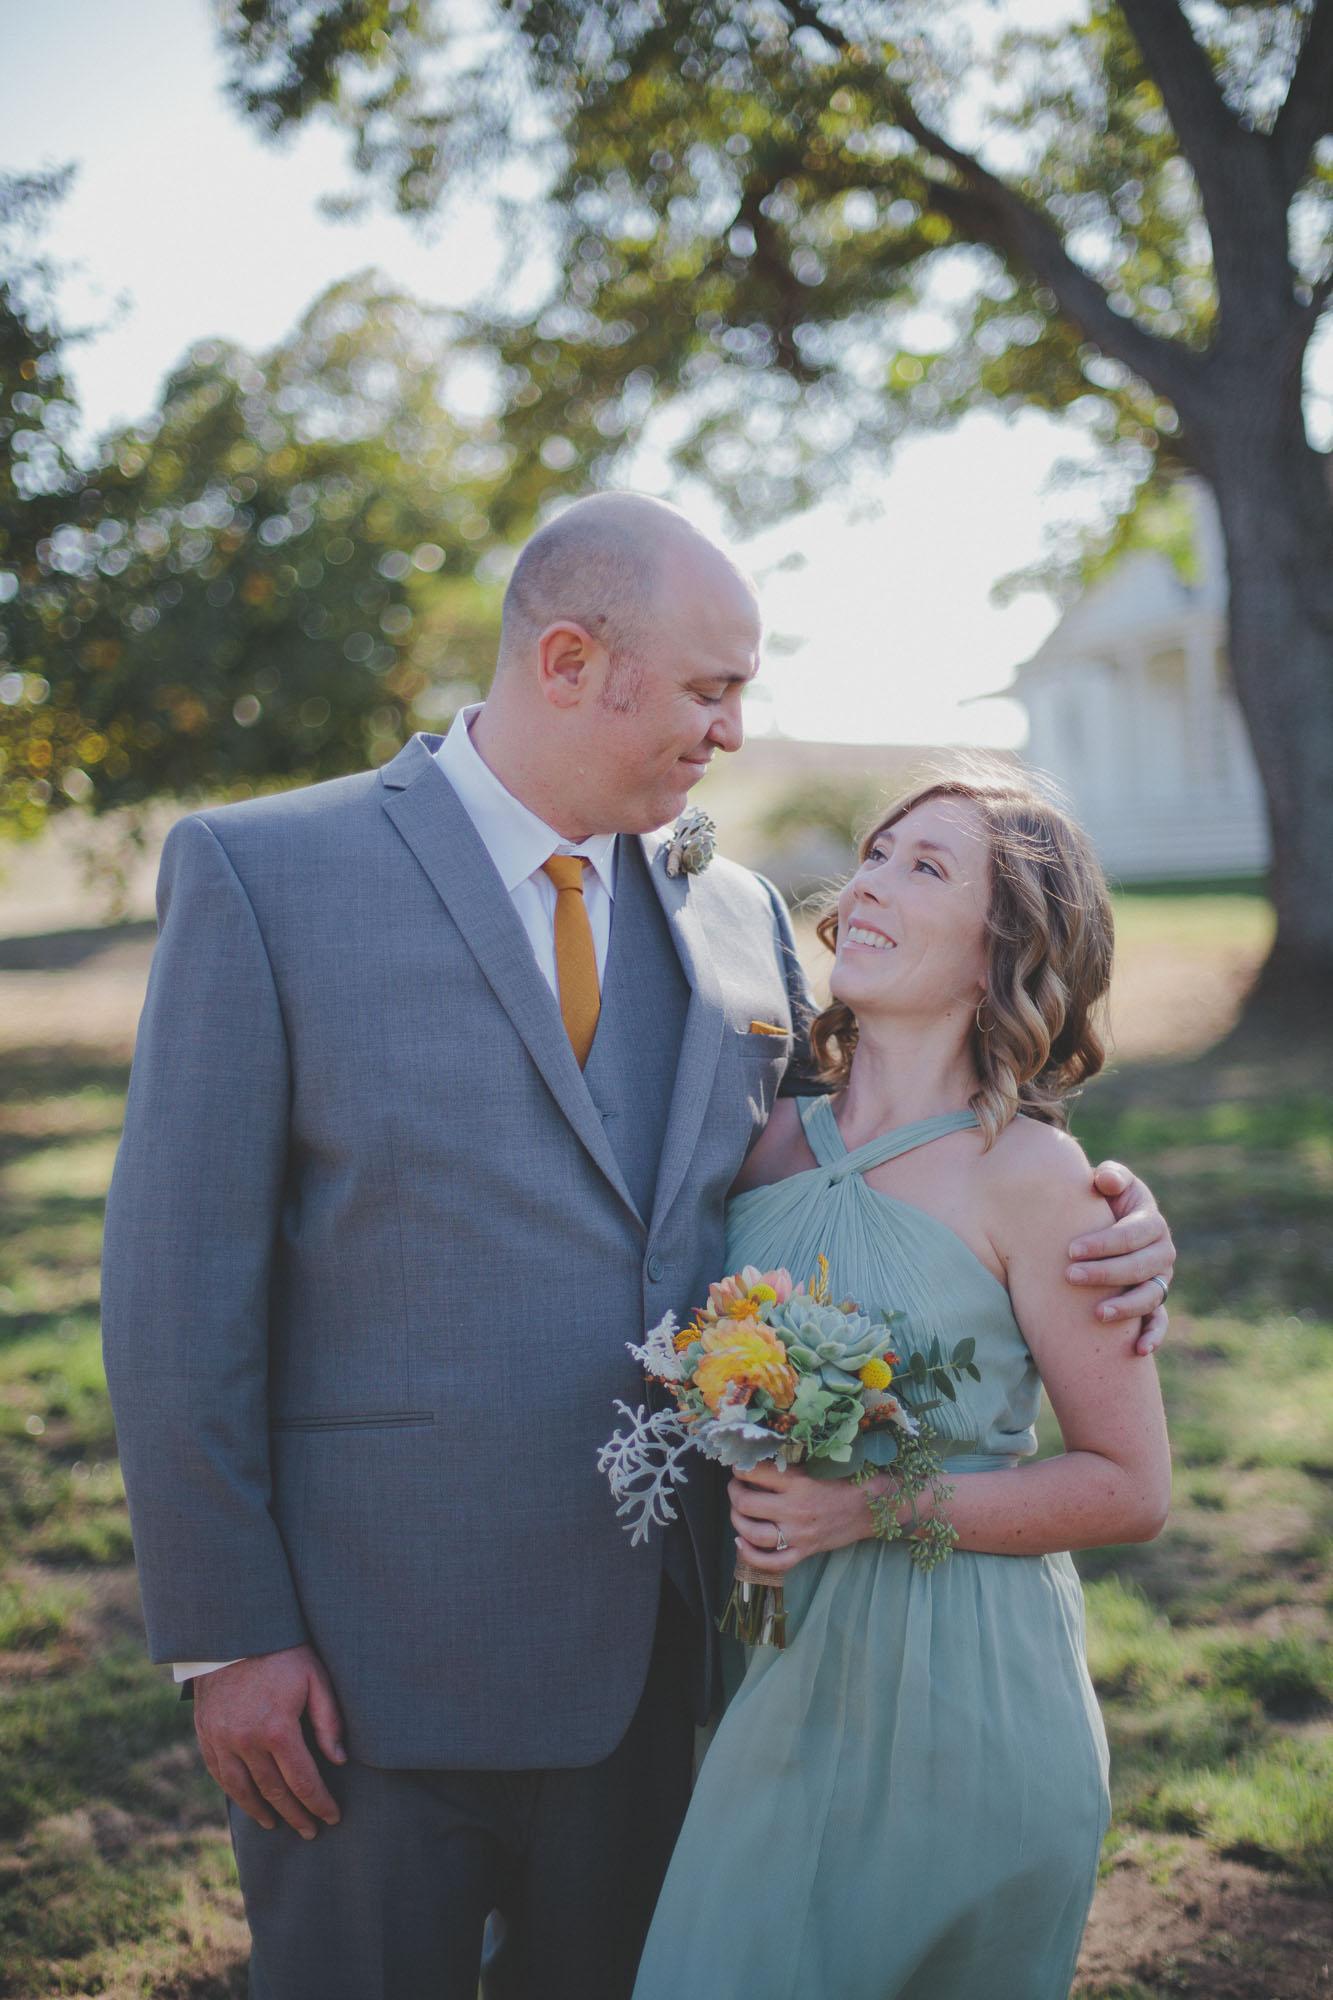 Gretchen_Gause_Petaluma_Olympias_Valley_Wedding_Photo-116.jpg